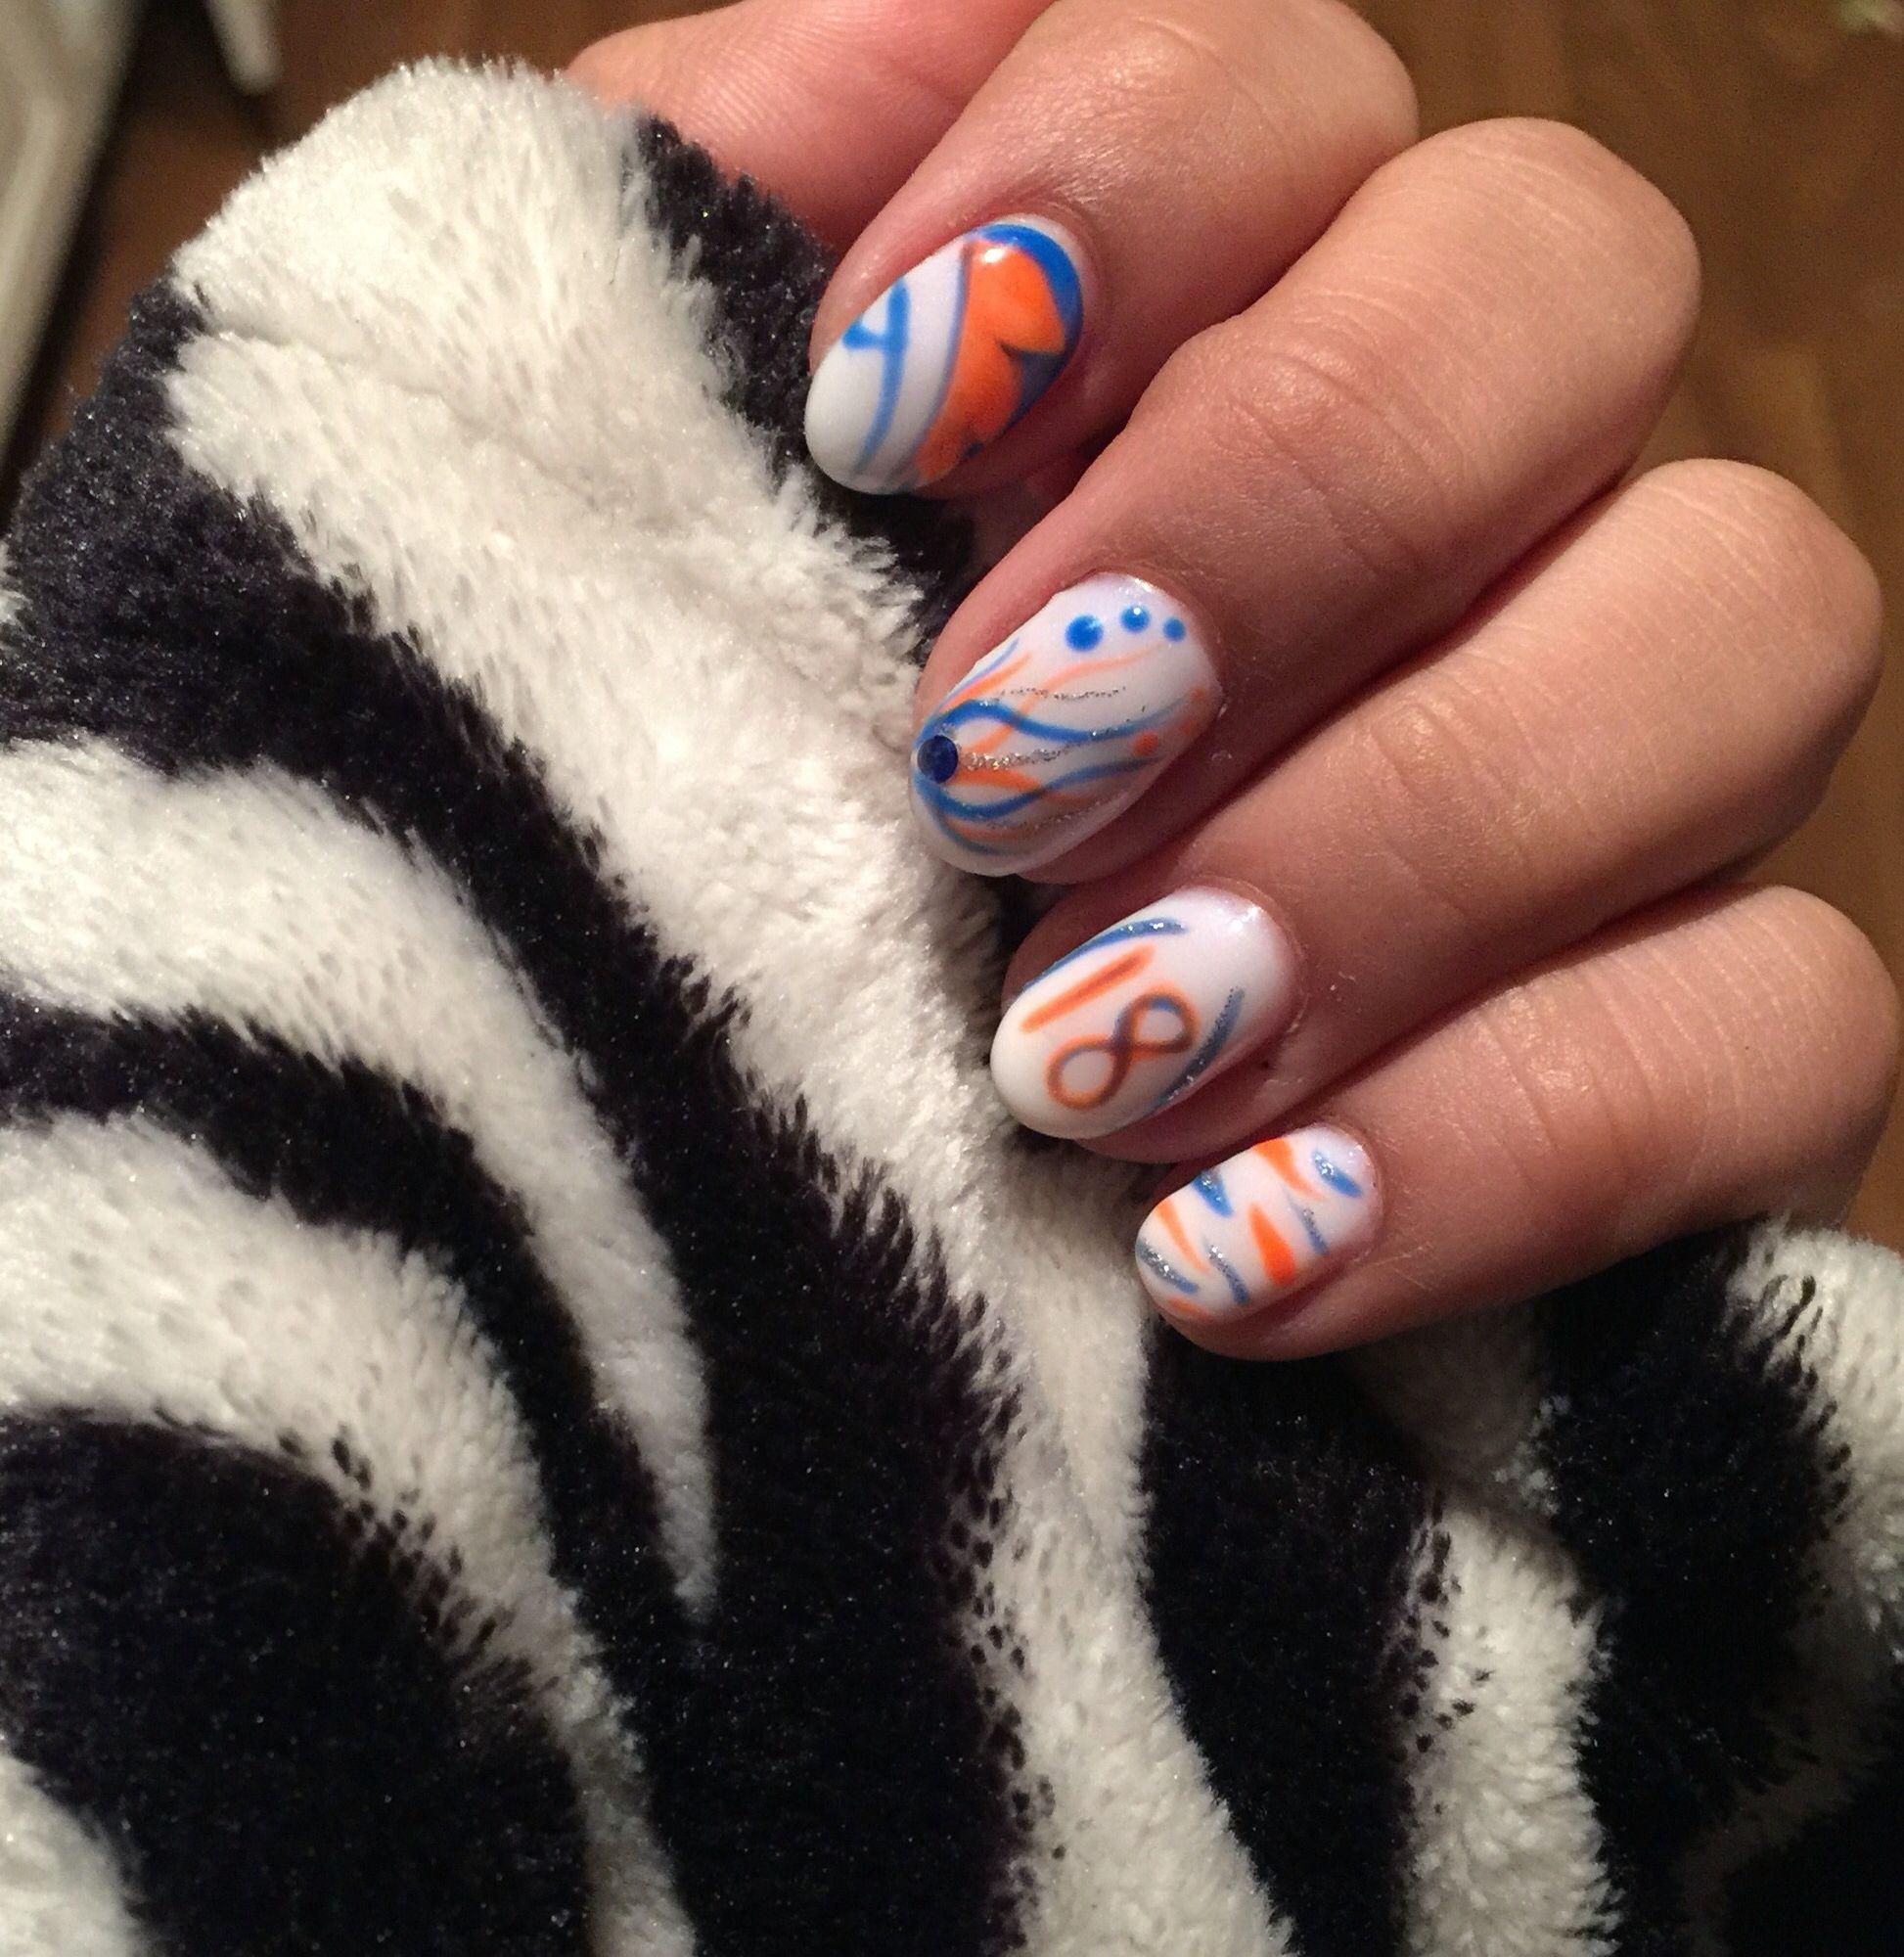 Denver Broncos Nail art theme   Denver Bronco nail art   Pinterest ...